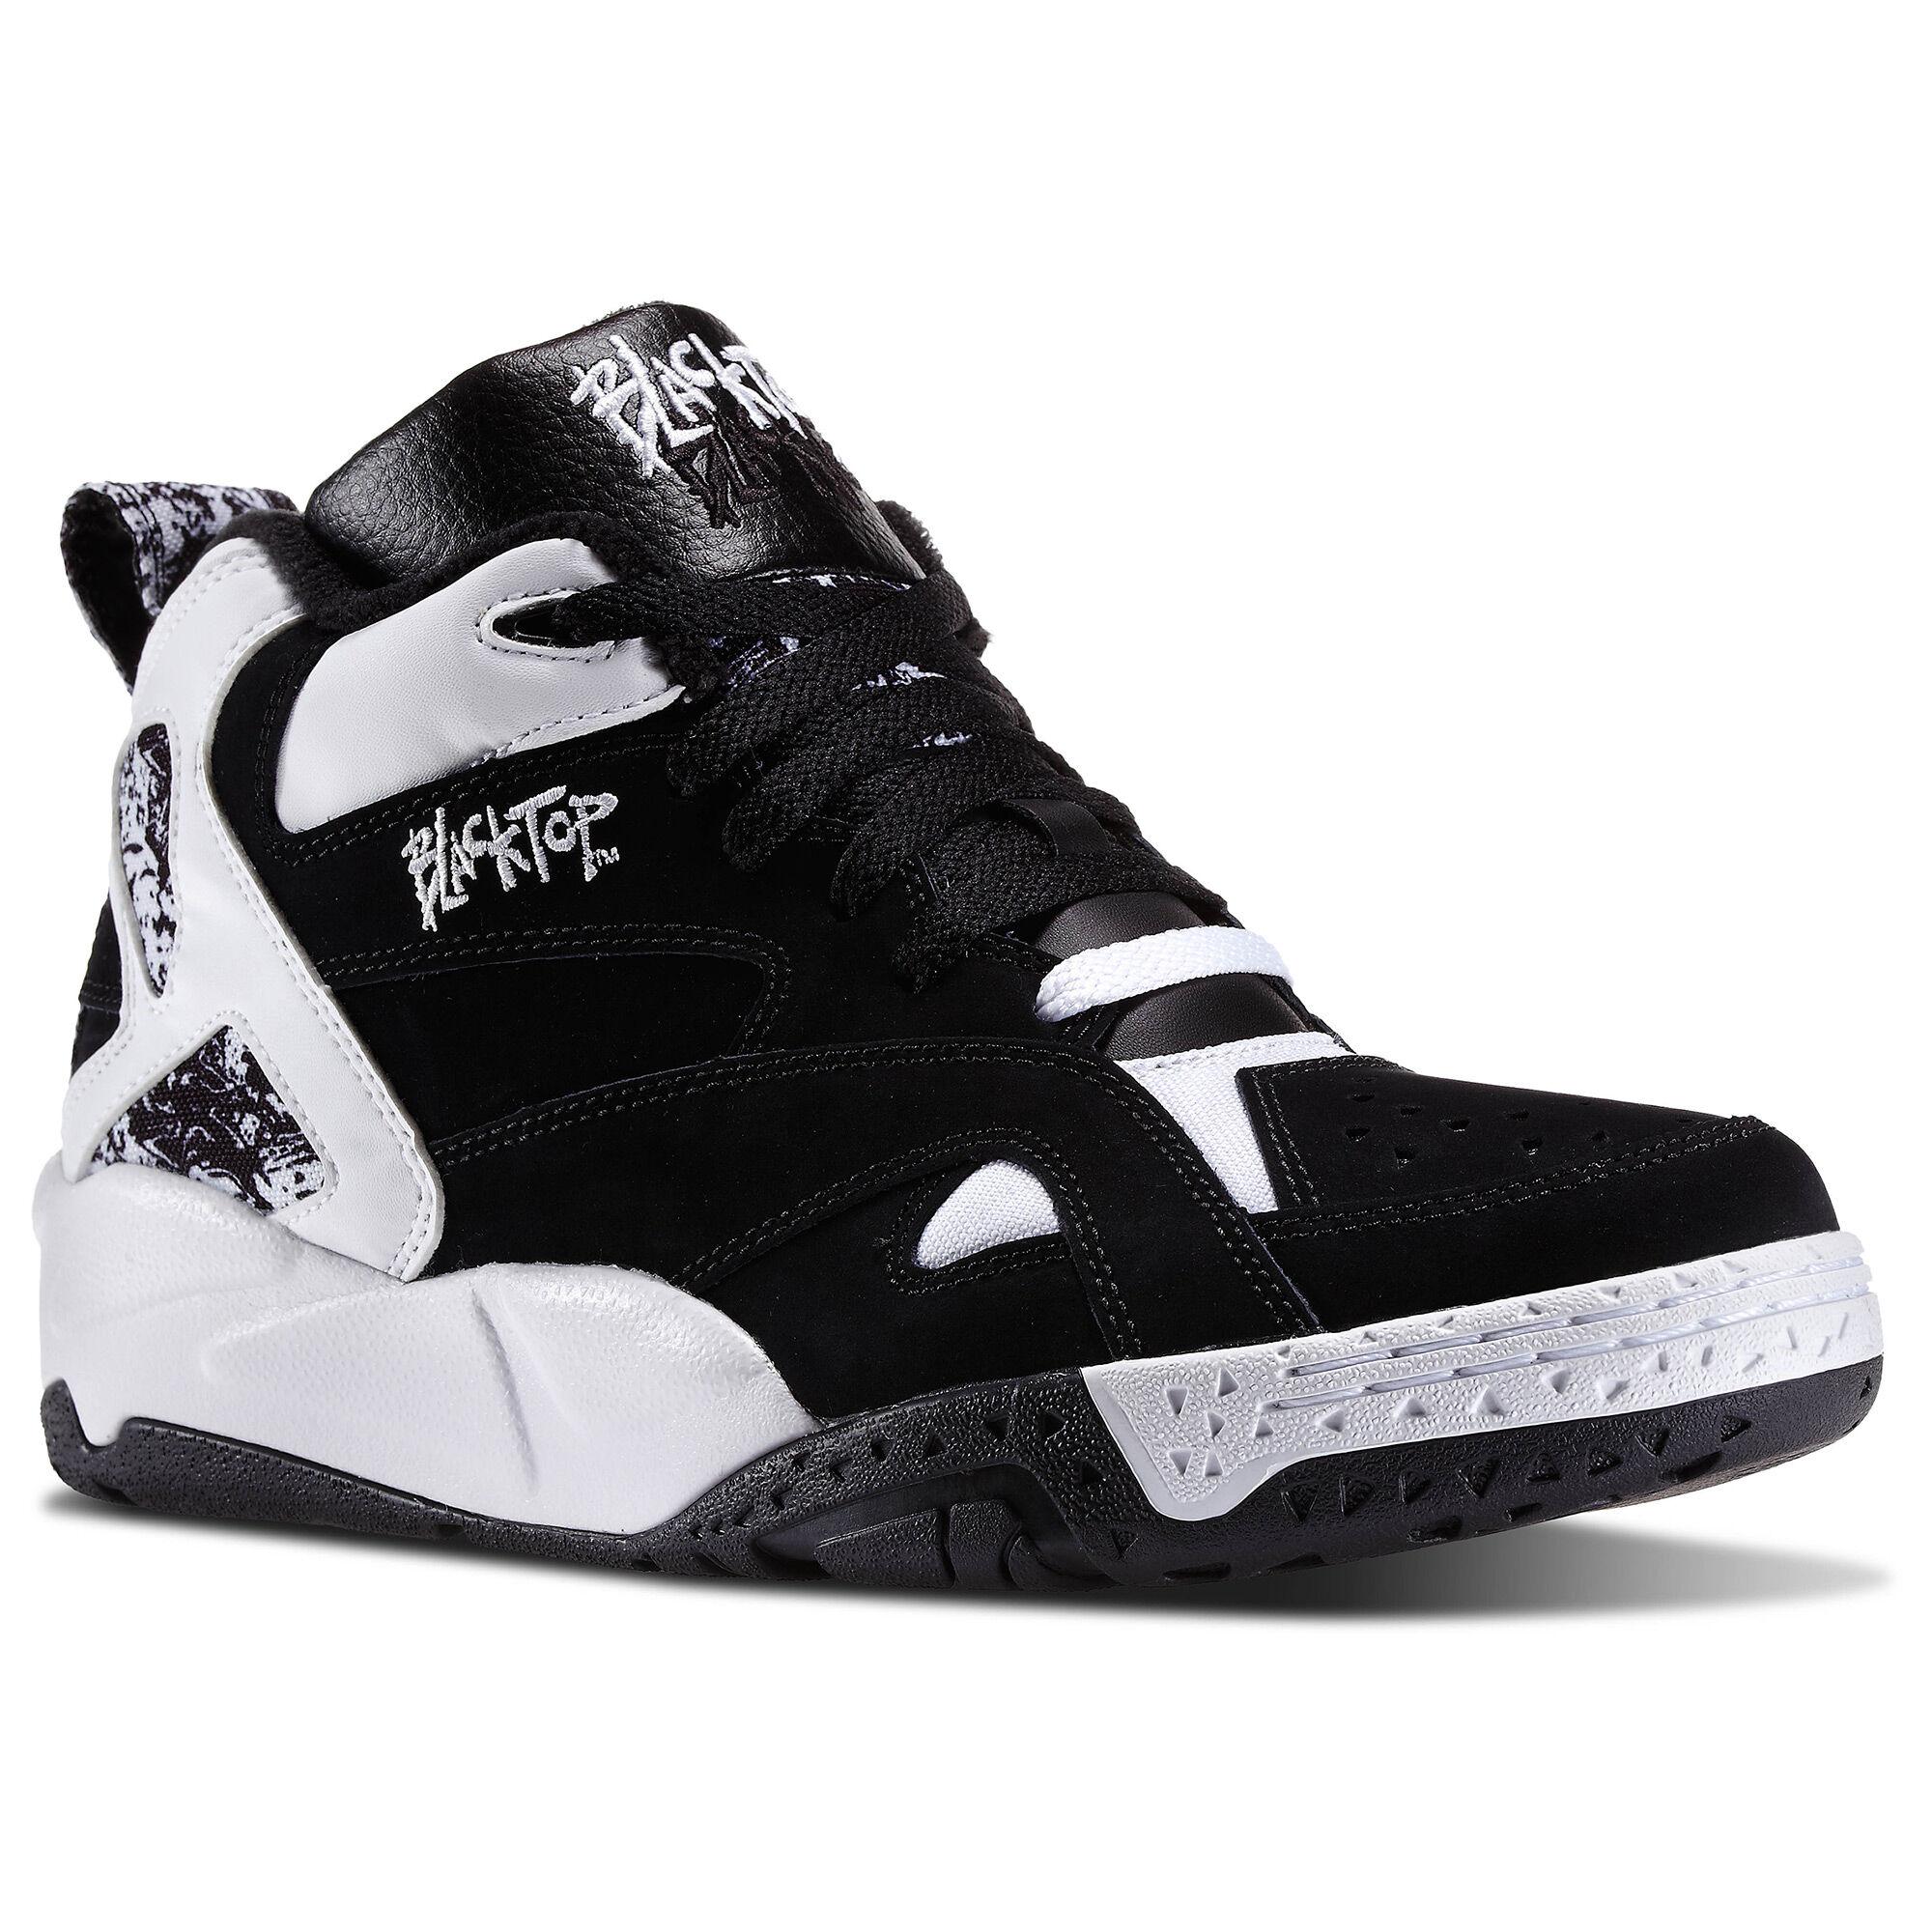 reebok blacktop. reebok blacktop shoes